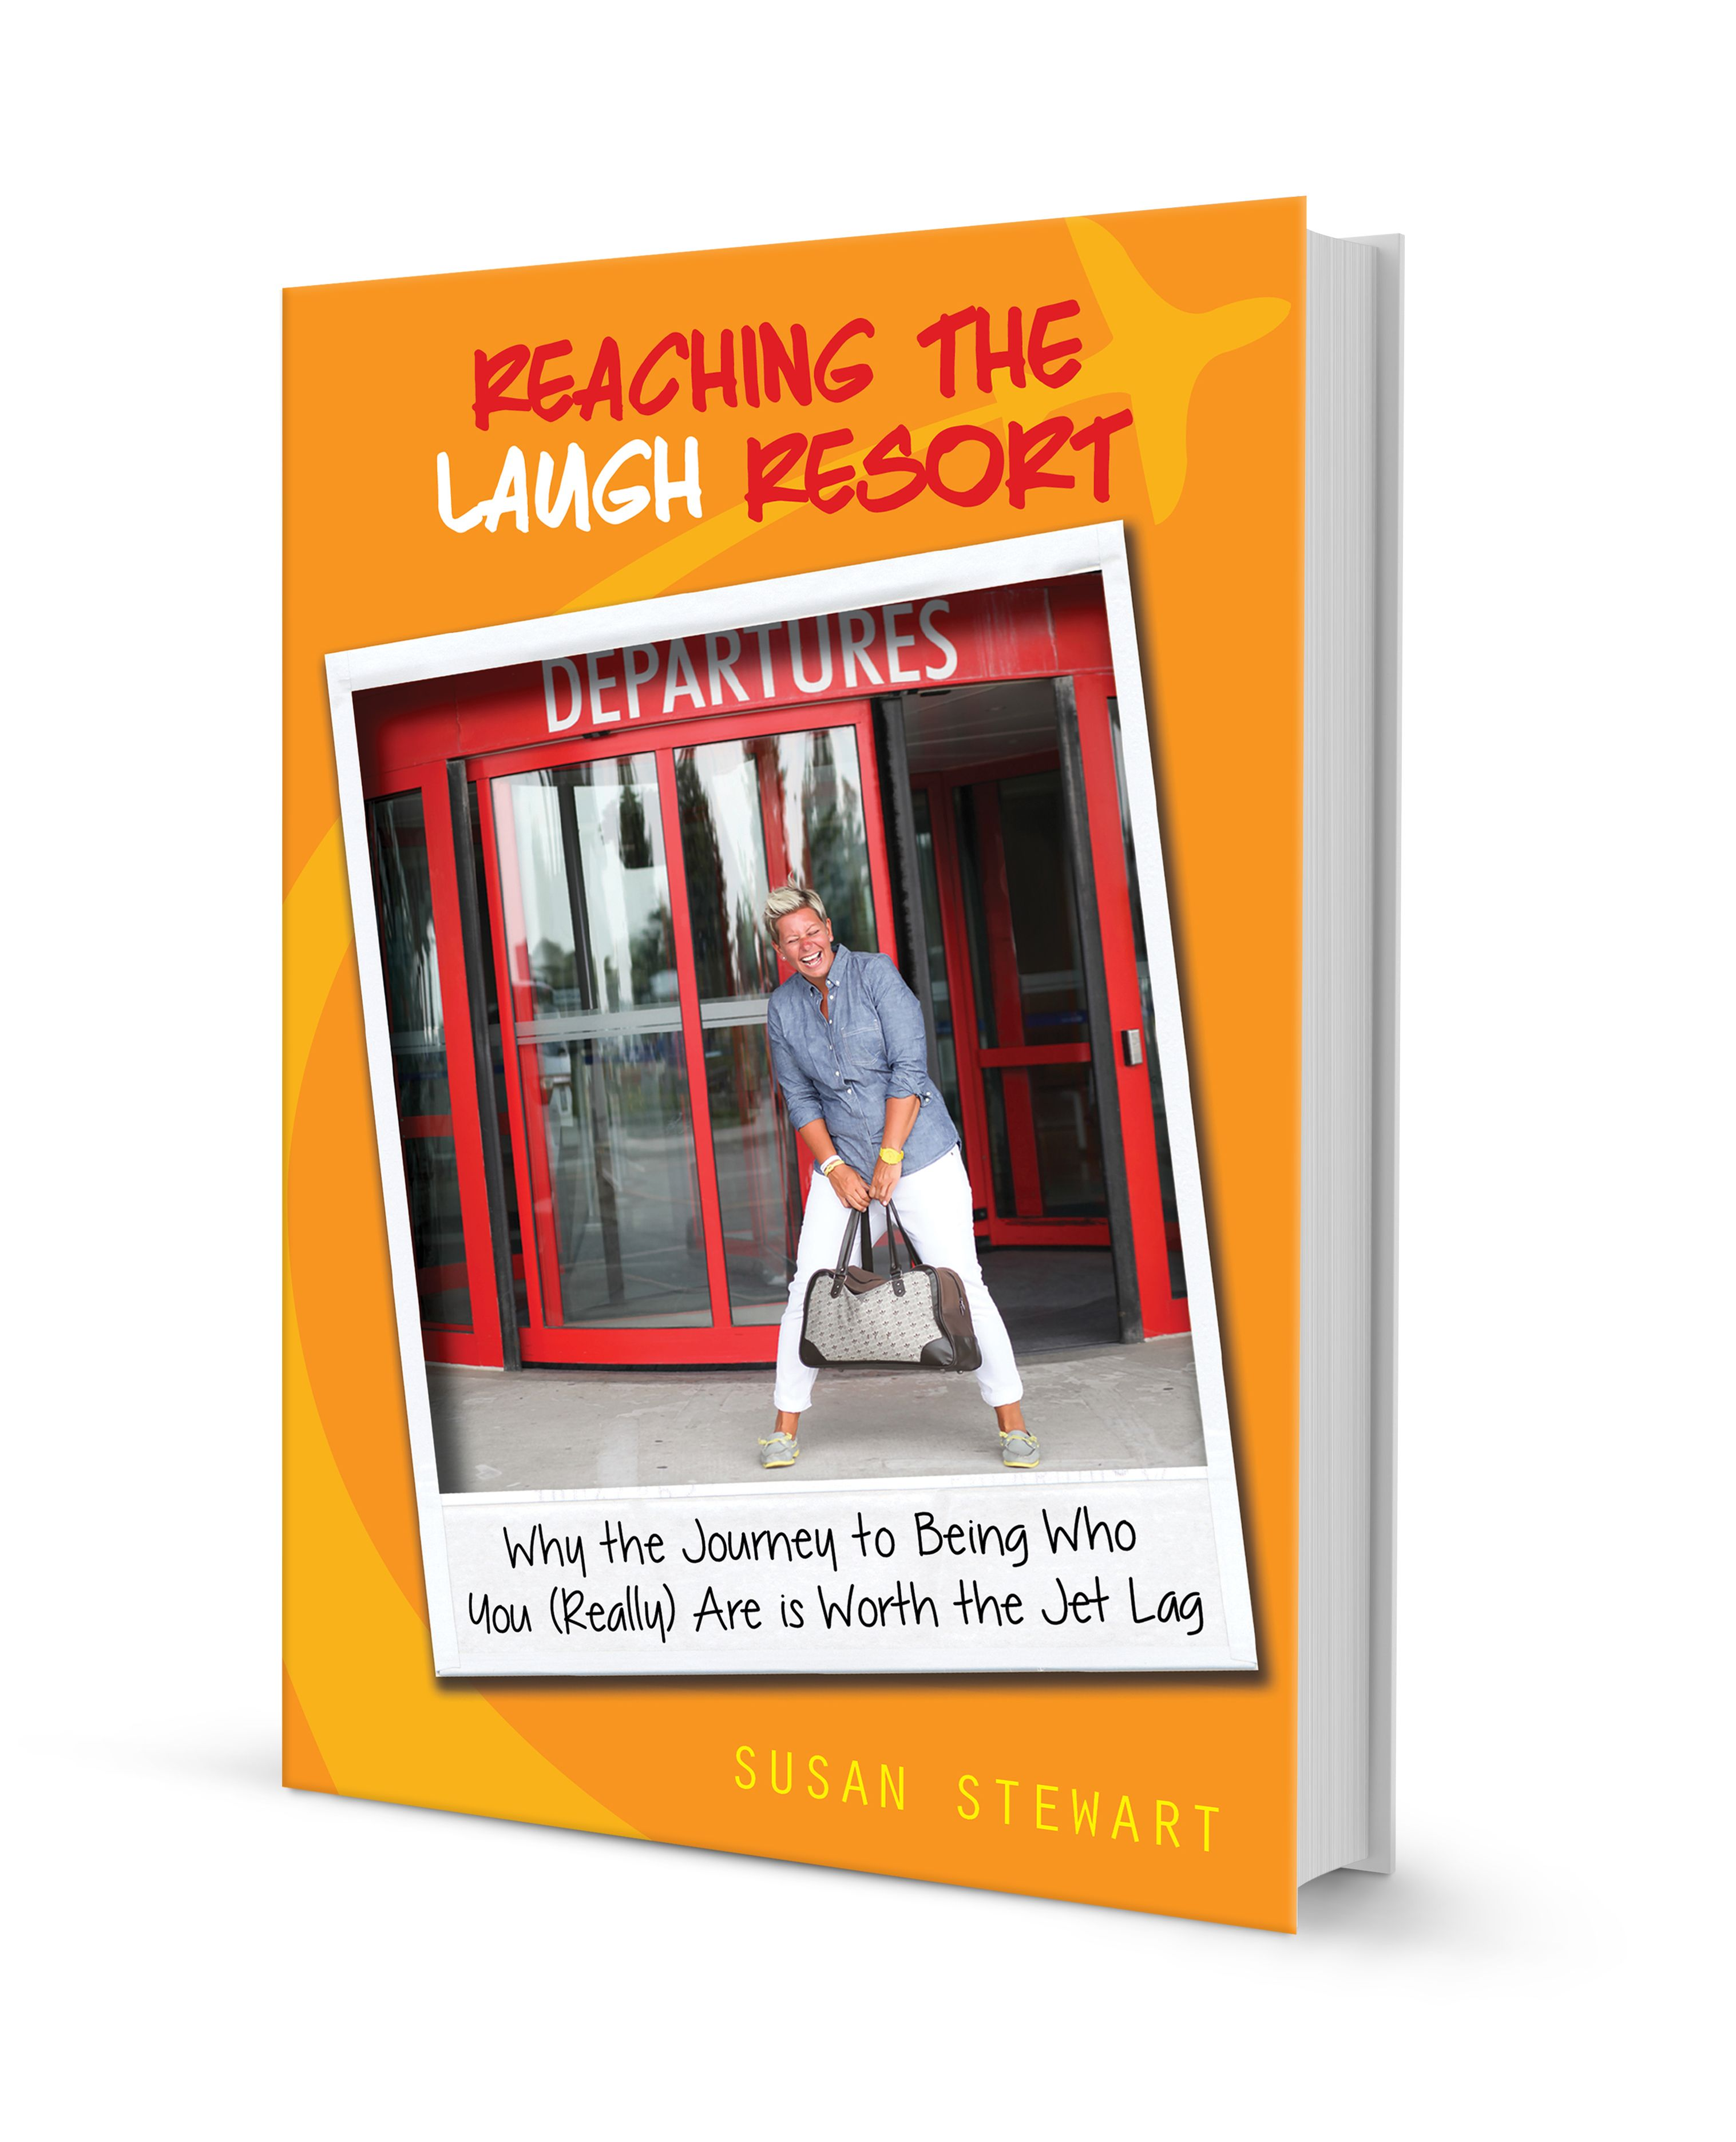 Reaching The Laugh Resort E-book For Apple, Nook, & Kobo